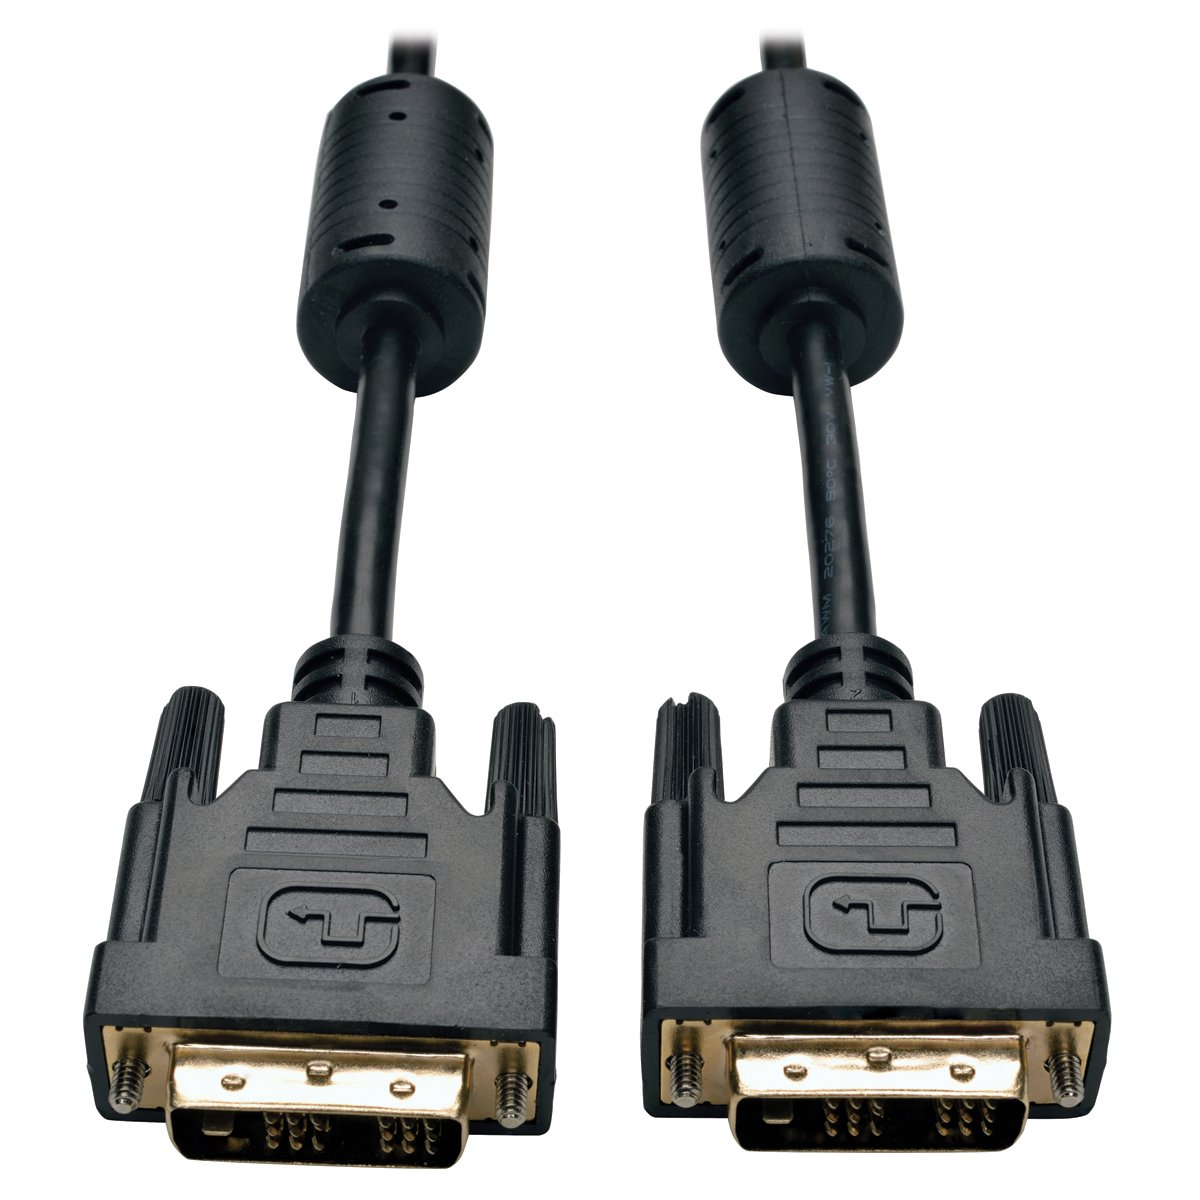 Tripp Lite DVI Single Link Cable, Digital TMDS Monitor Cable (DVI-D M/M) 50-ft.(P561-050)